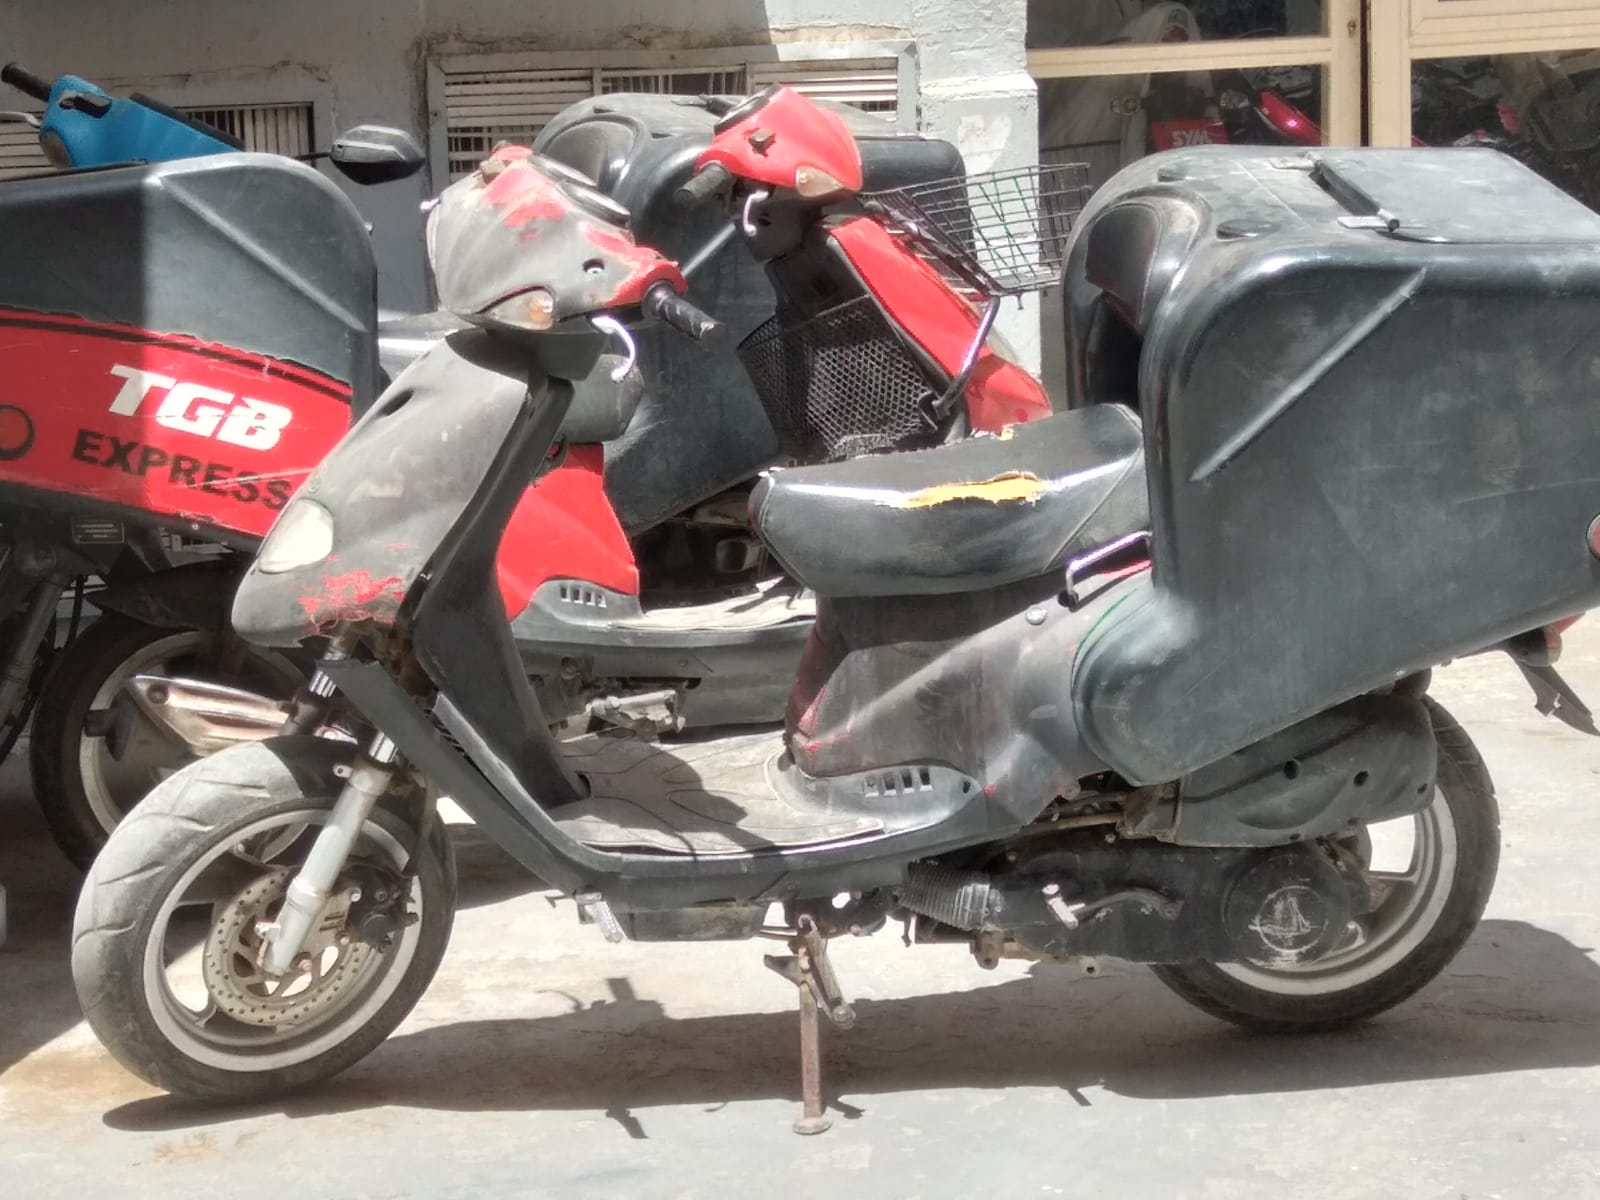 TGB delivery bike